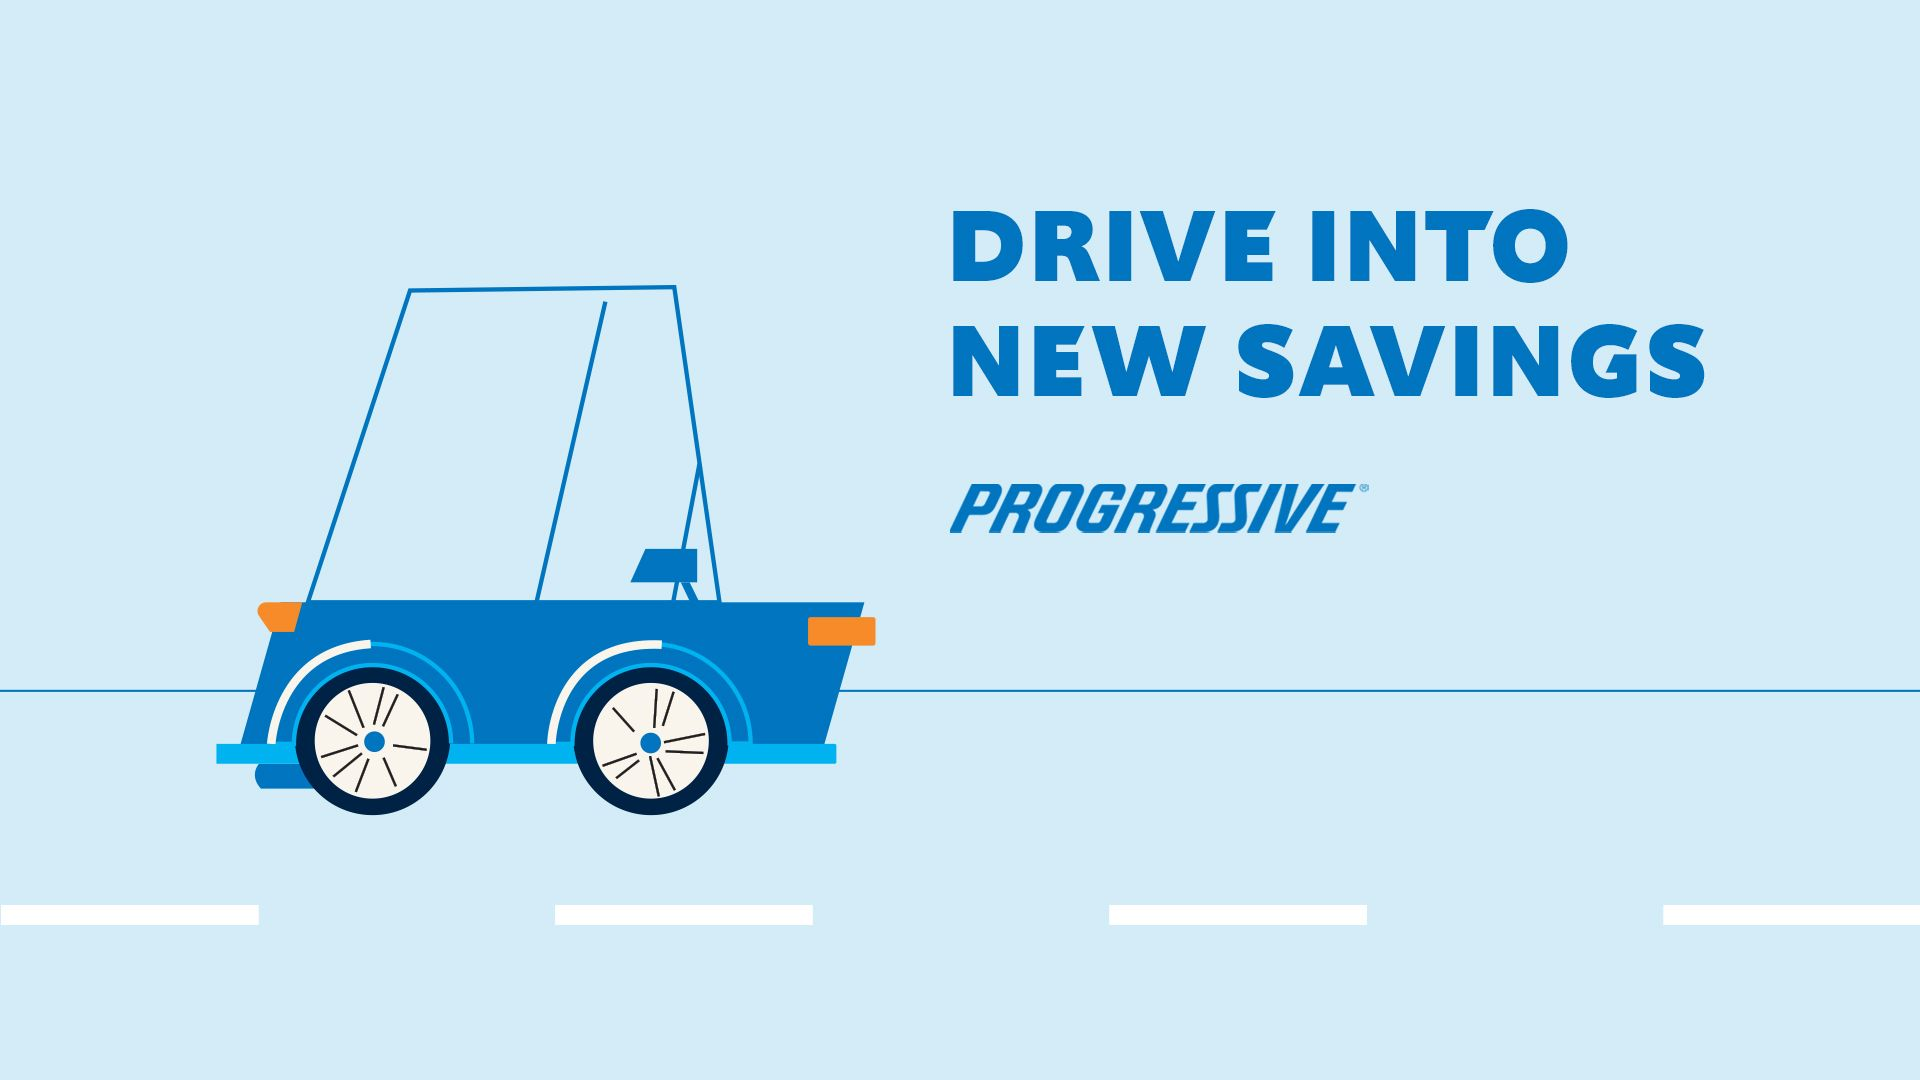 Personalized Rate From Progressive Auto Insurance In 2020 Progressive Insurance Progressive Auto Progress